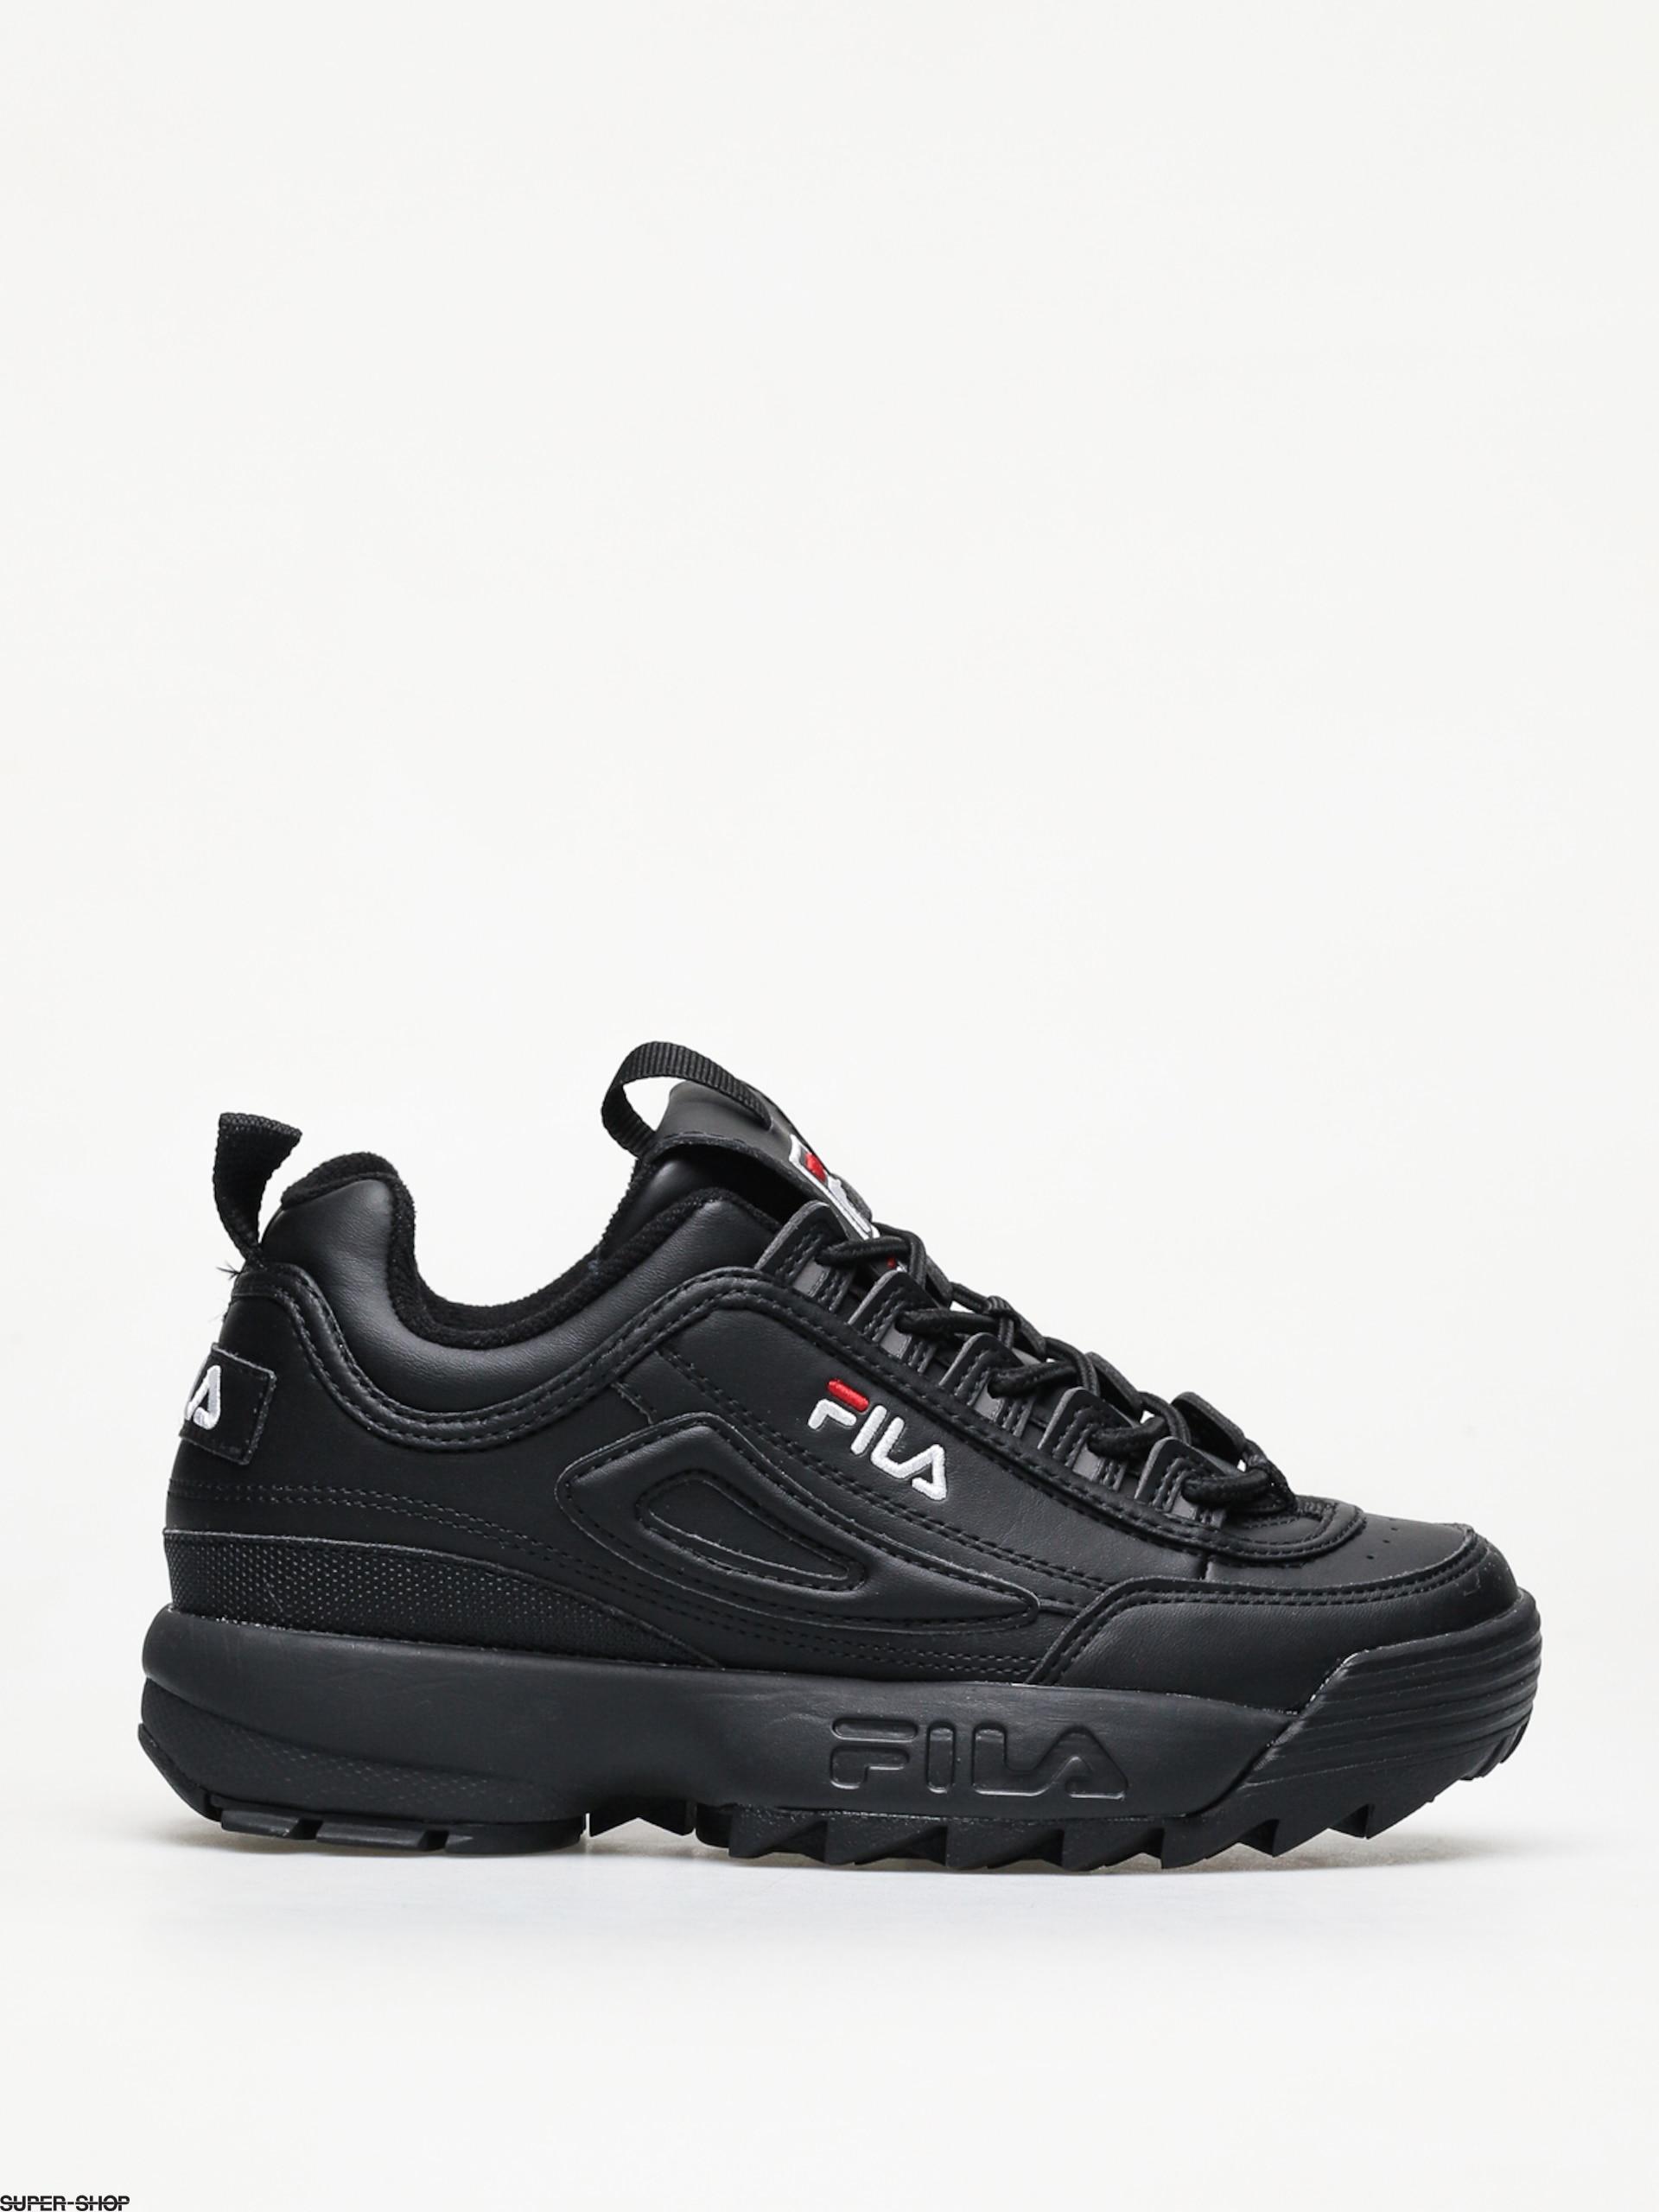 Fila Disruptor Low Schuhe